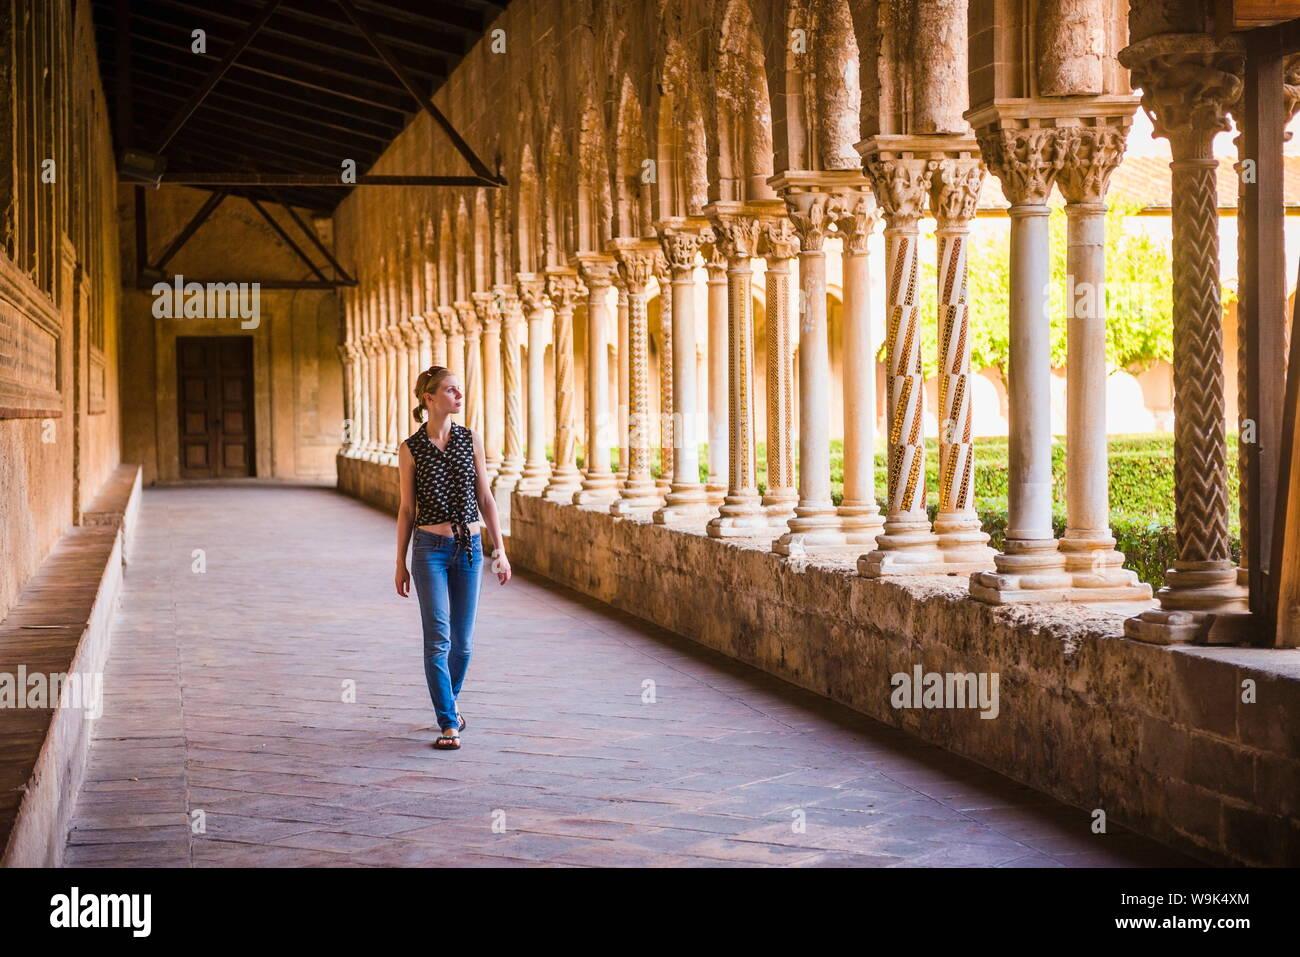 Tourist at Monreale Cathedral (Duomo di Monreale) in courtyard gardens, Monreale, near Palermo, Sicily, Italy, Europe Stock Photo